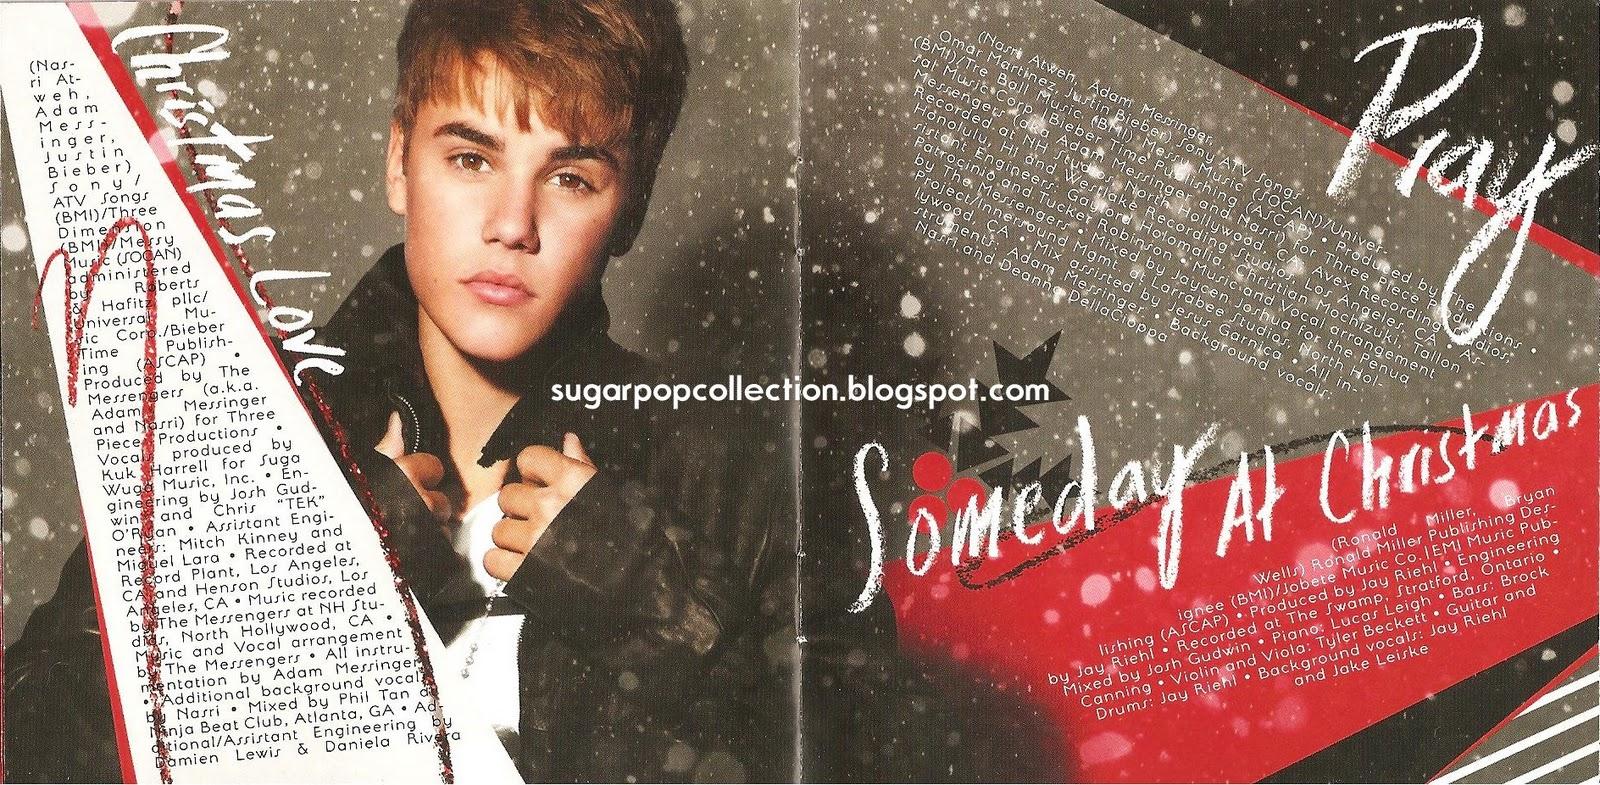 Justin bieber under the mistletoe album download itunes || Ilife mp3 ...